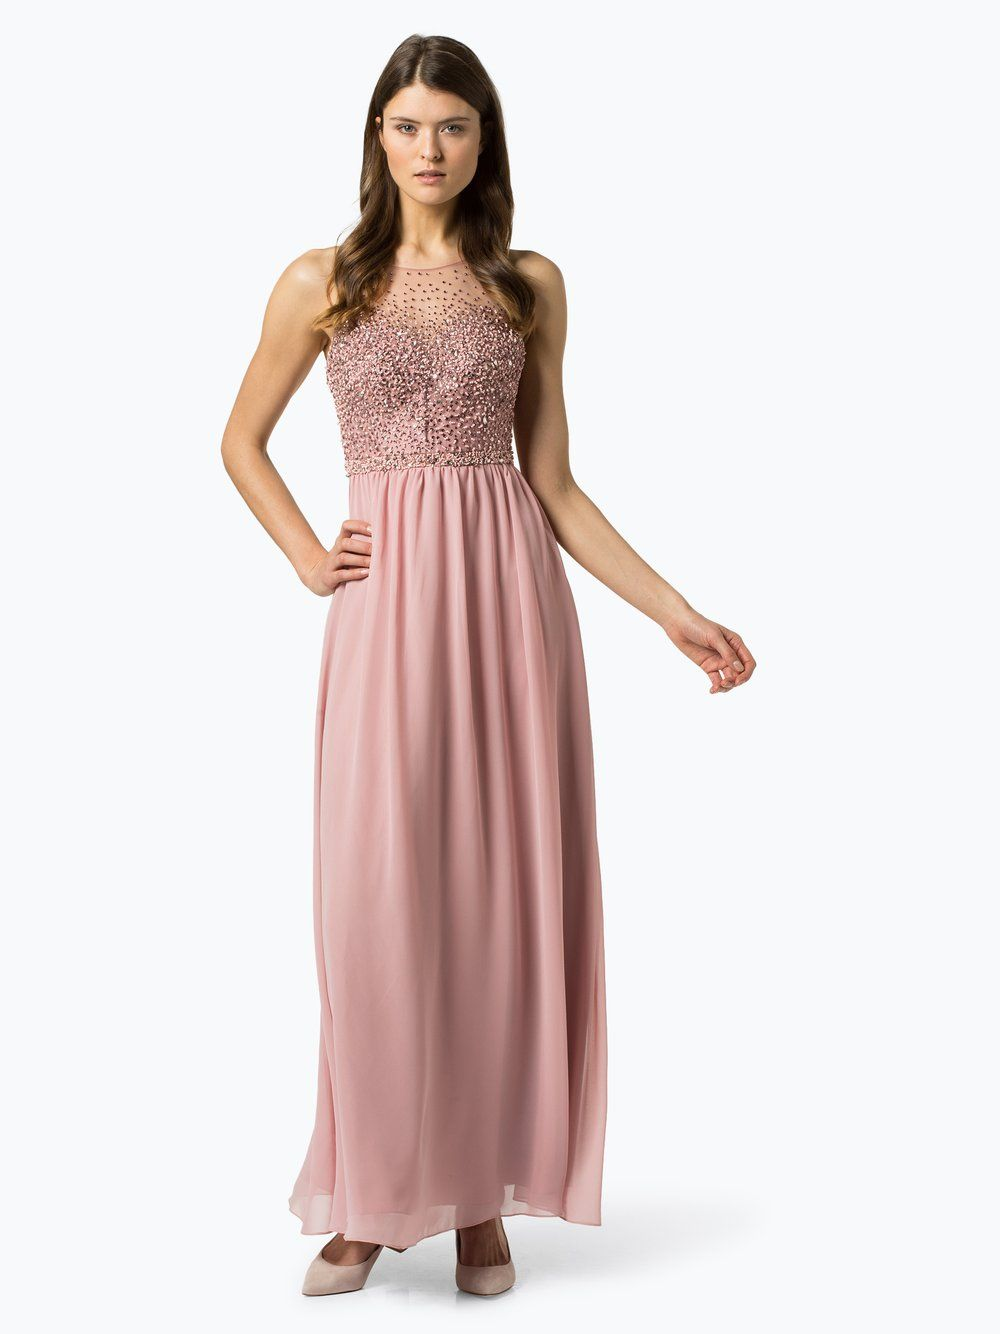 Laona Abendkleid rosa  Abendkleid rosa, Kleid hochzeit